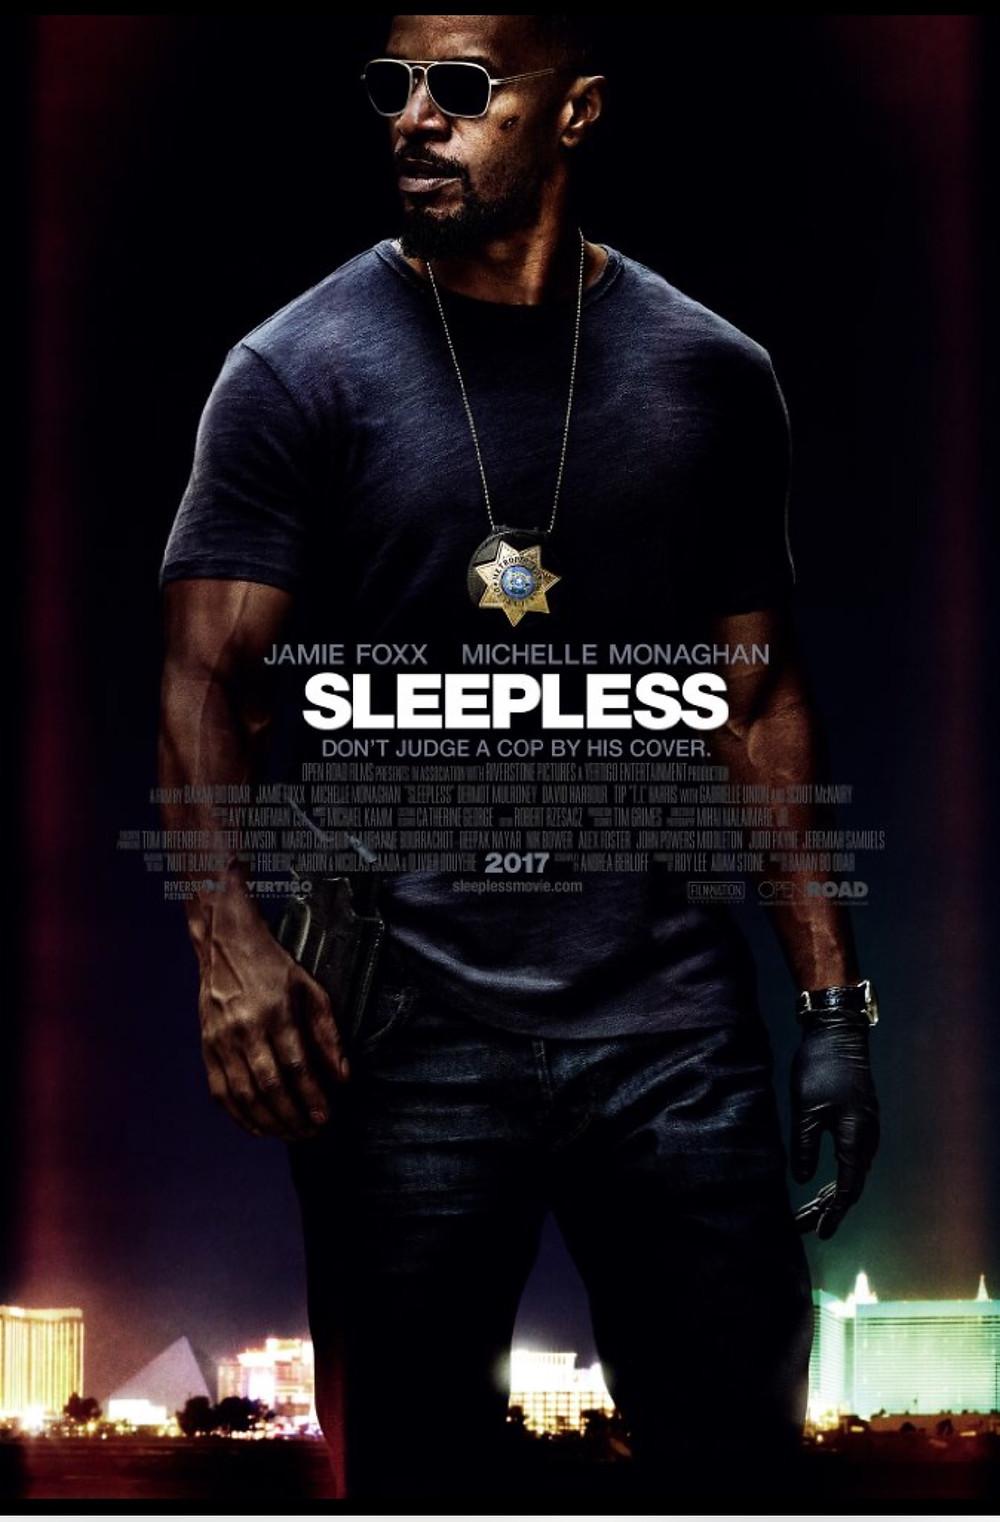 Sleepless with Jamie Foxx and Eli Everette